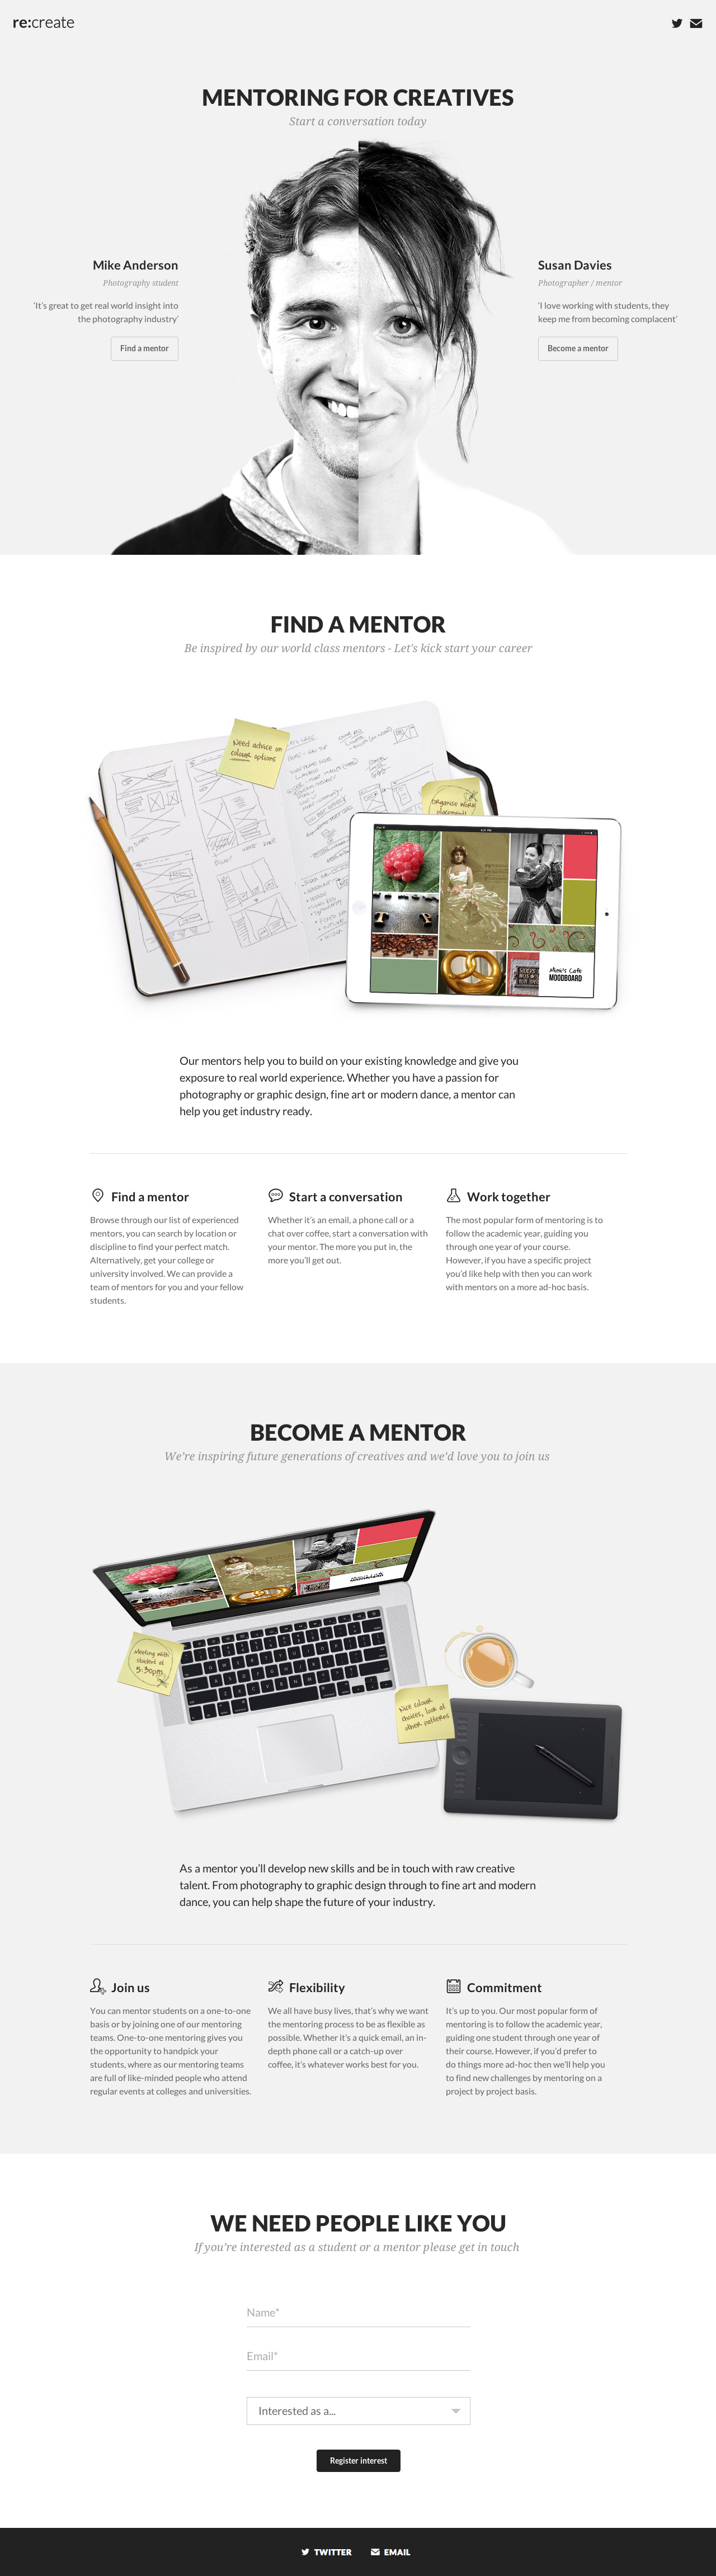 re:create Website Screenshot